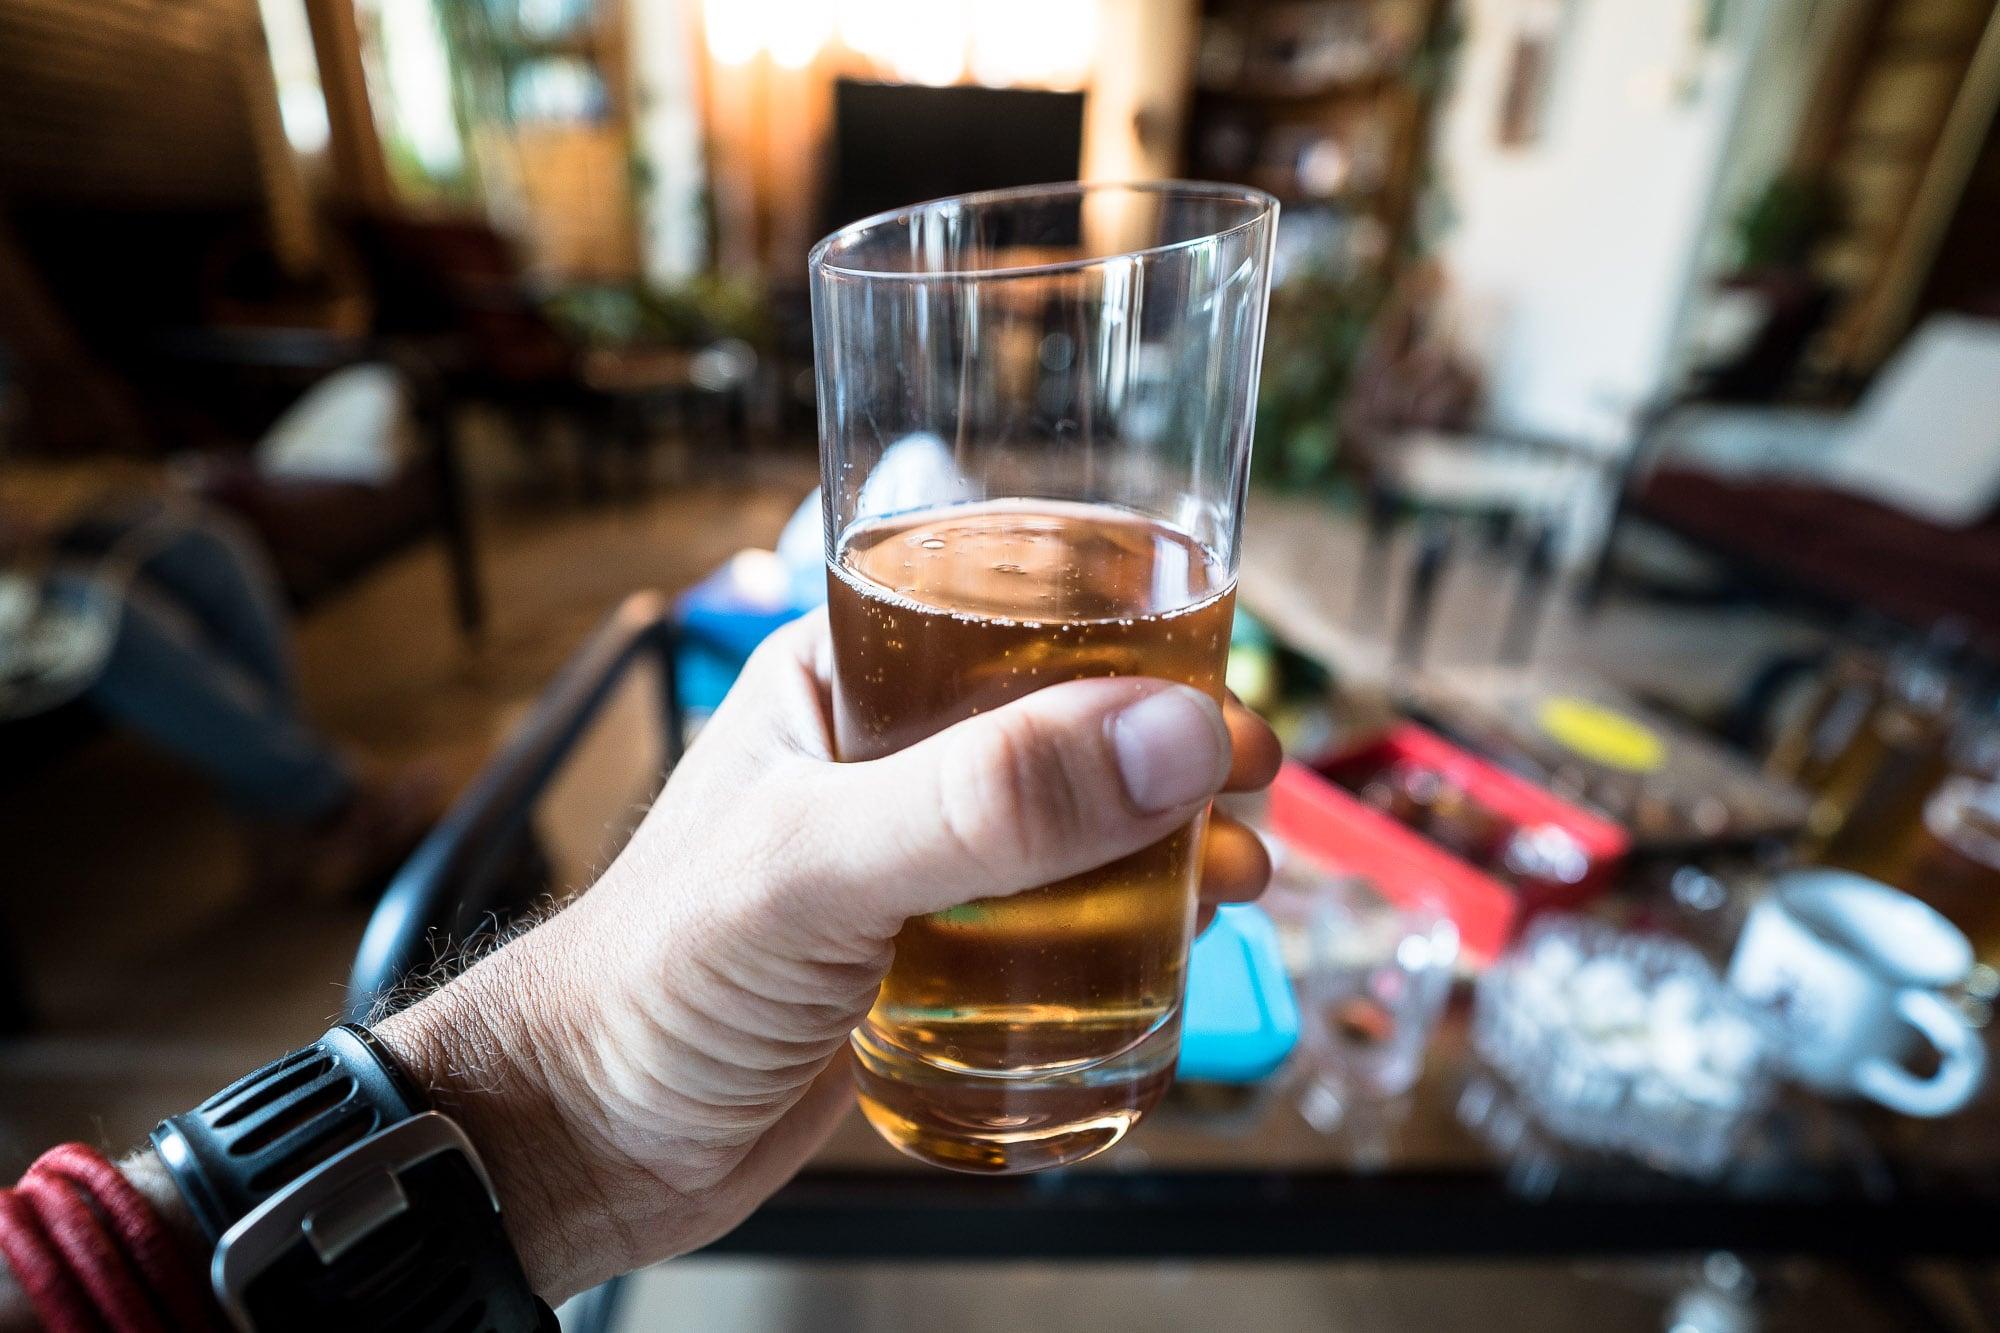 Iranian home brewed beer